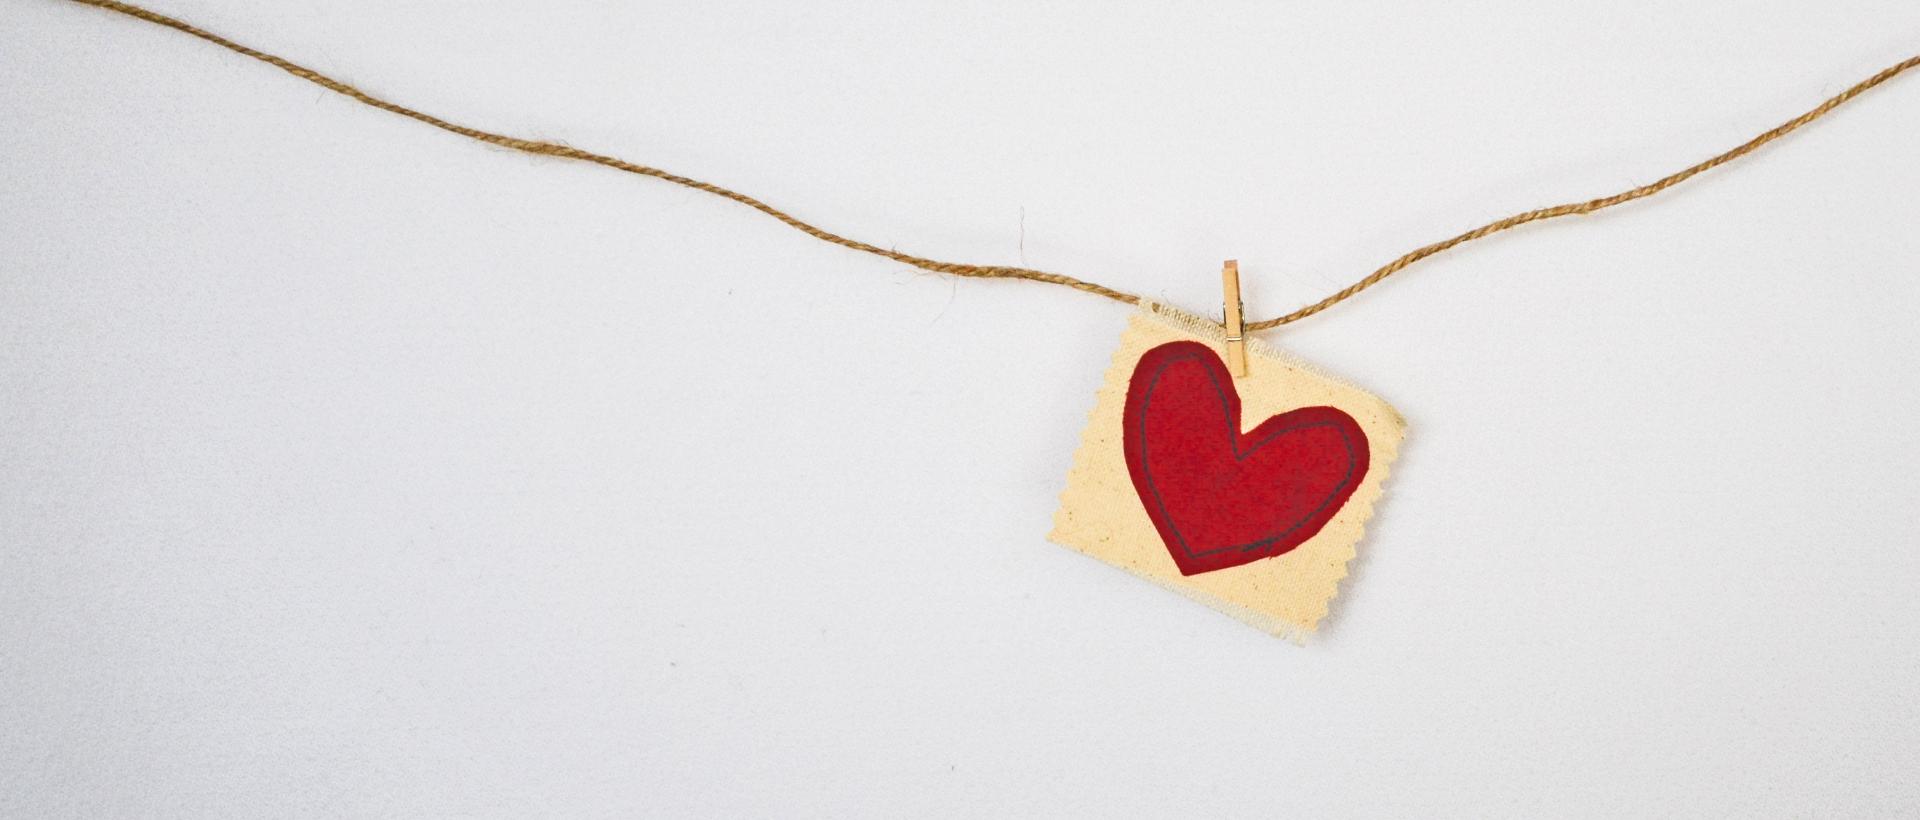 4 consejos honestos antes de iniciar un noviazgo cristiano